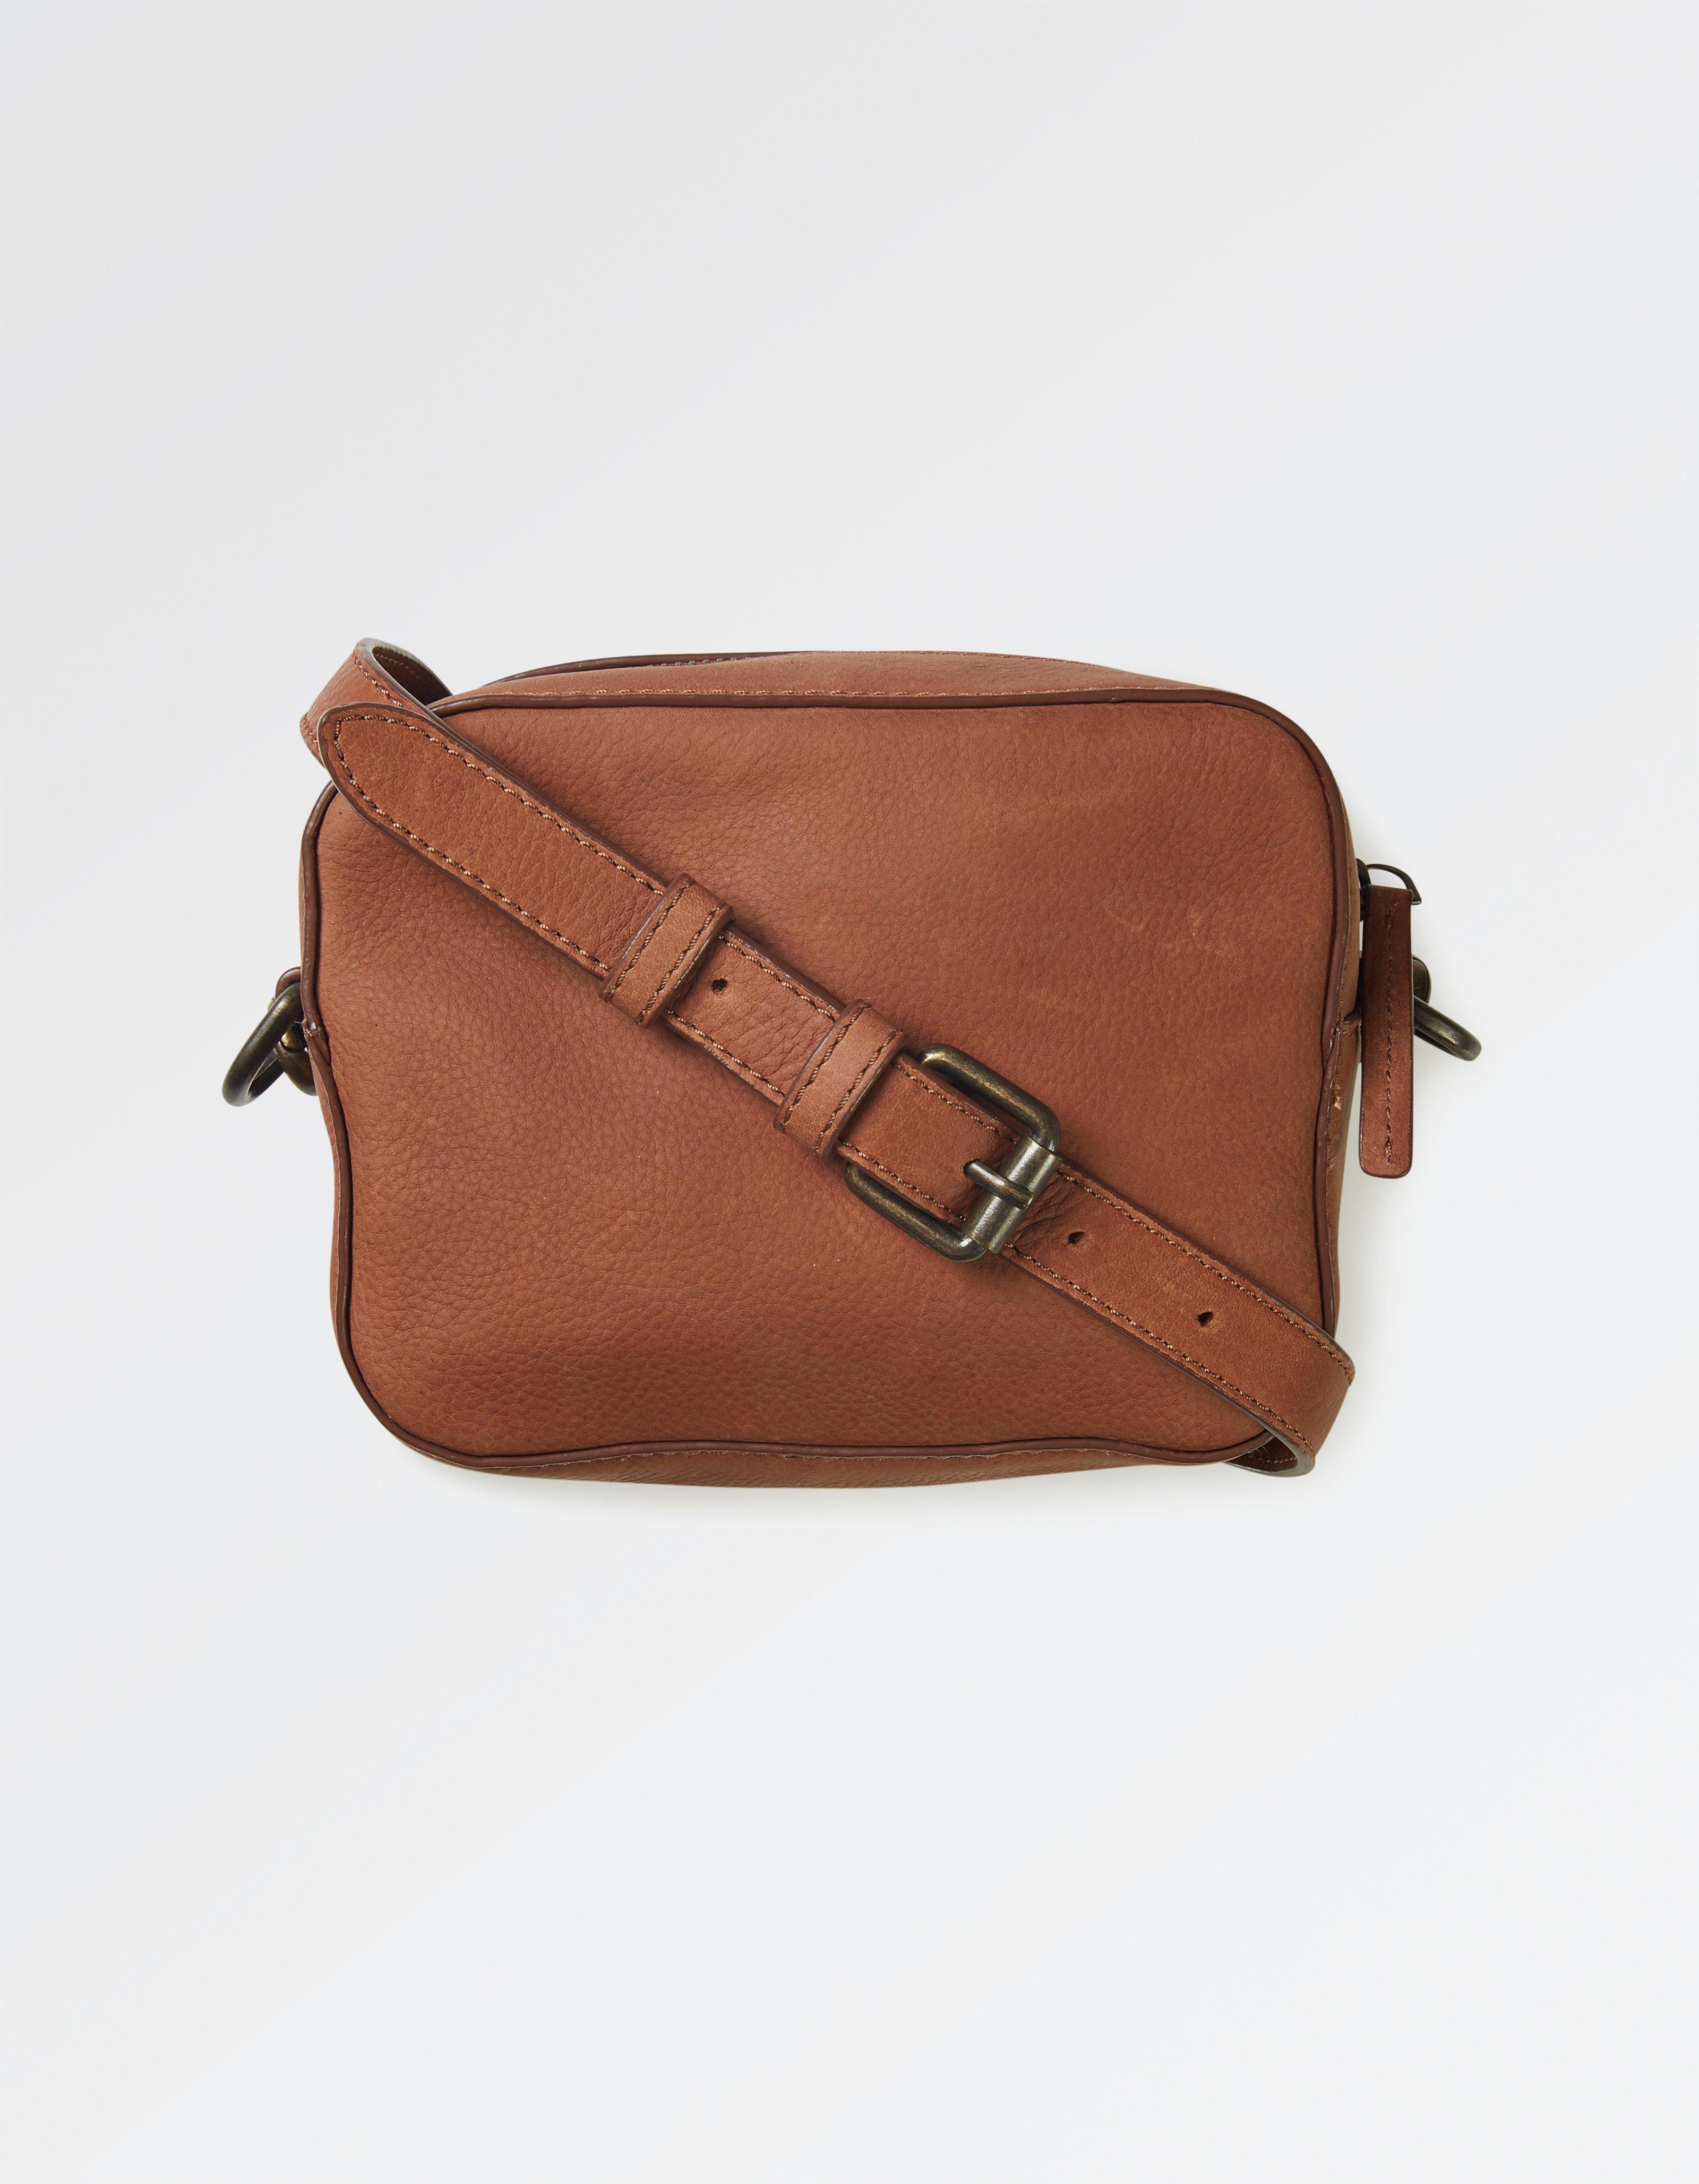 Small Camera Bag Cross Body